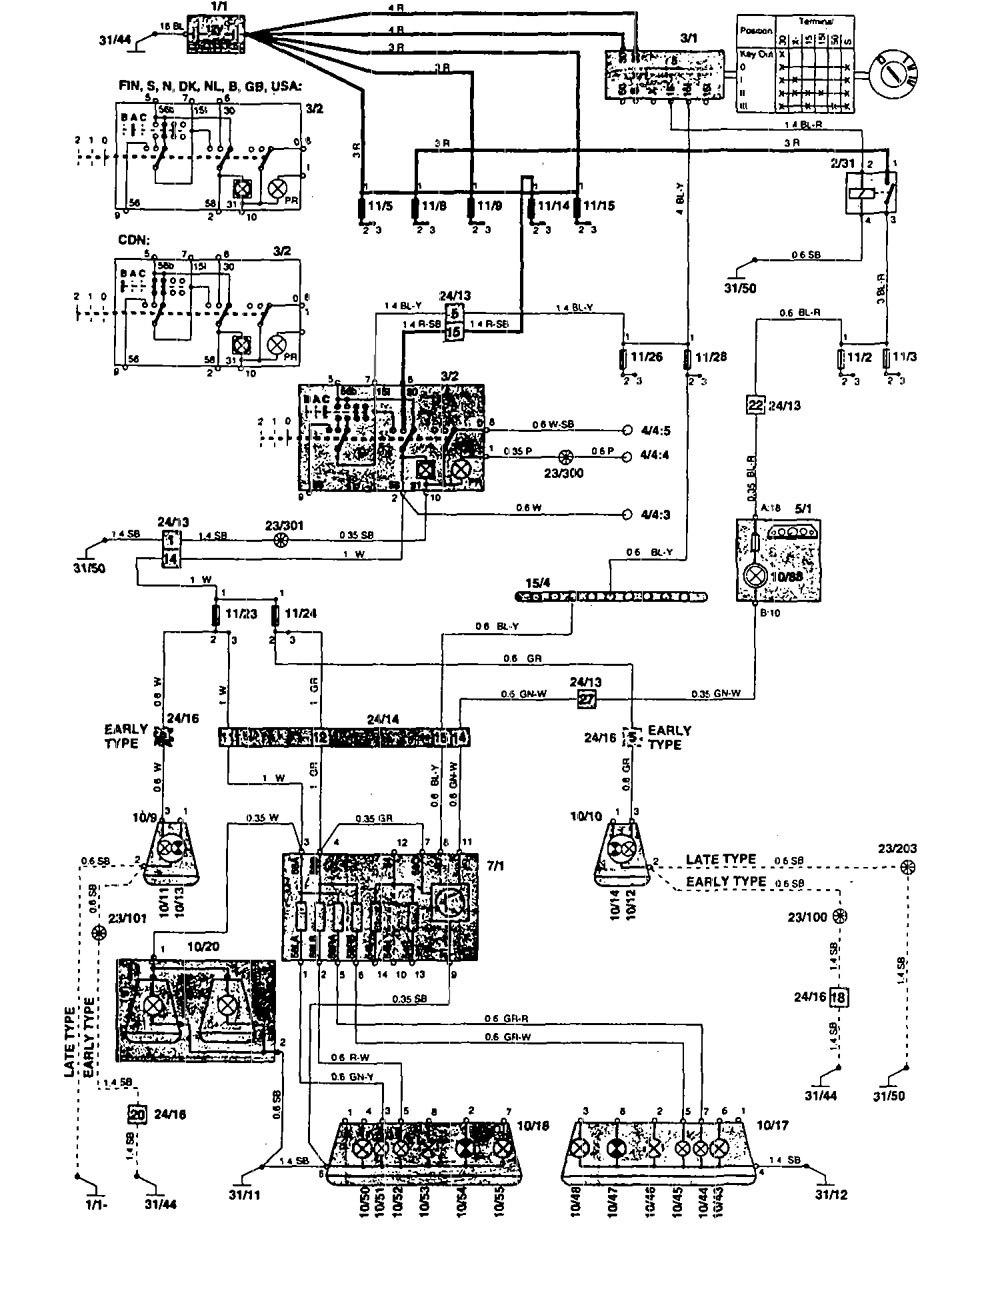 Volvo 850 tail light wiring new wiring diagram 2018